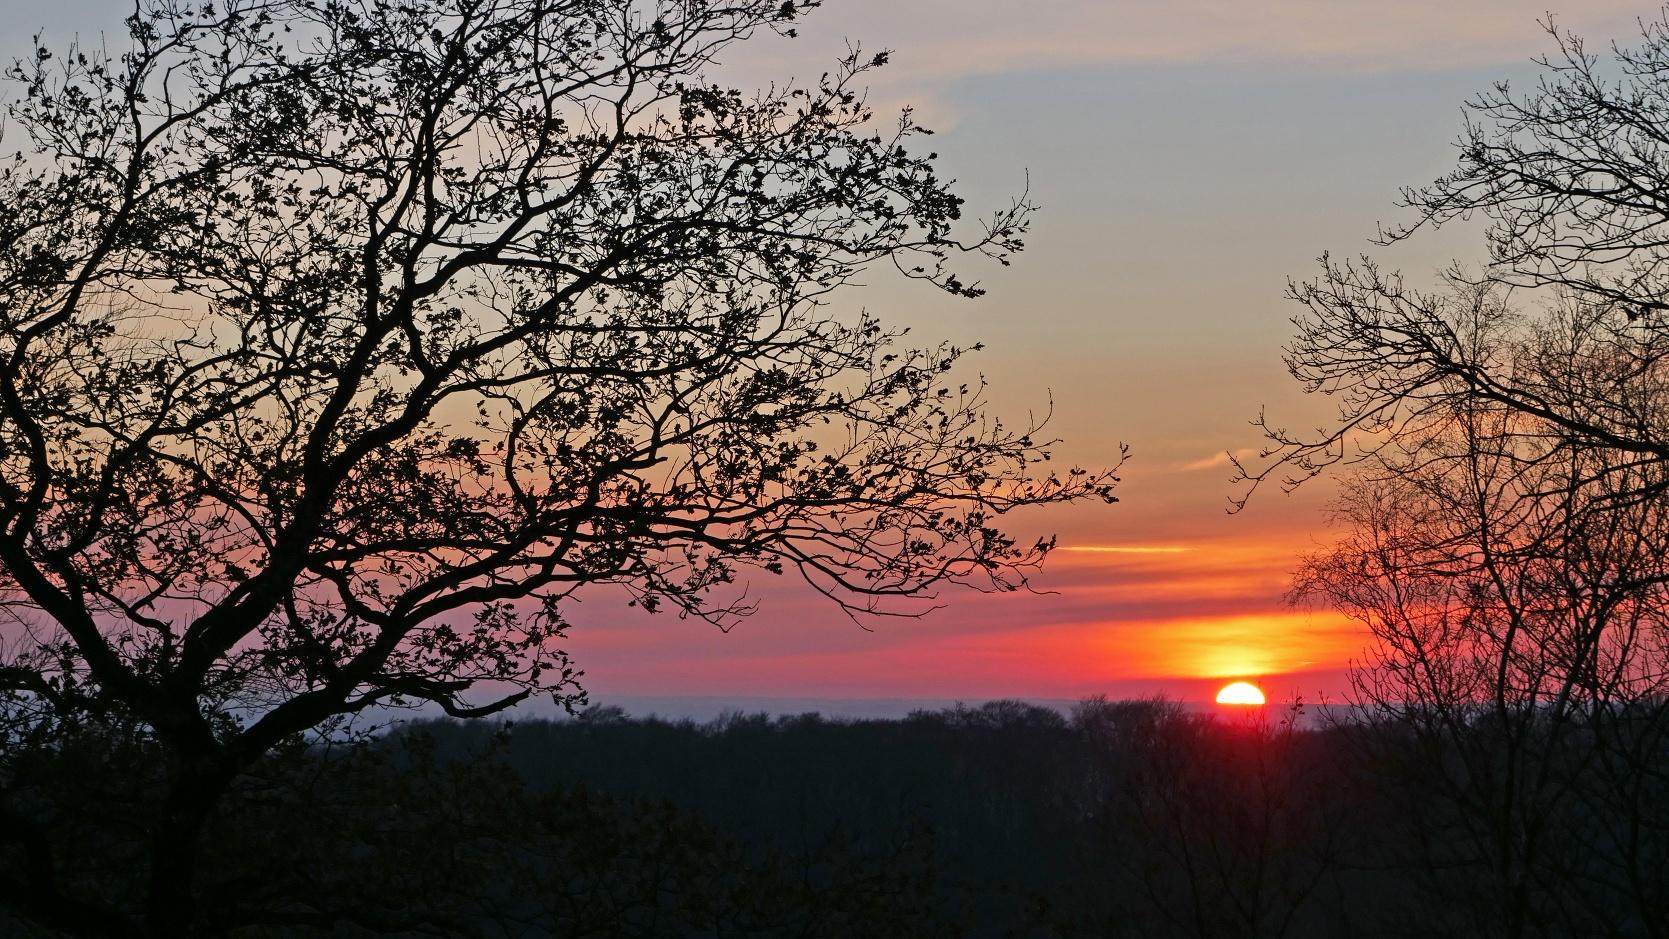 Sonnenuntergang auf dem Tönsberg in Oerlinghausen